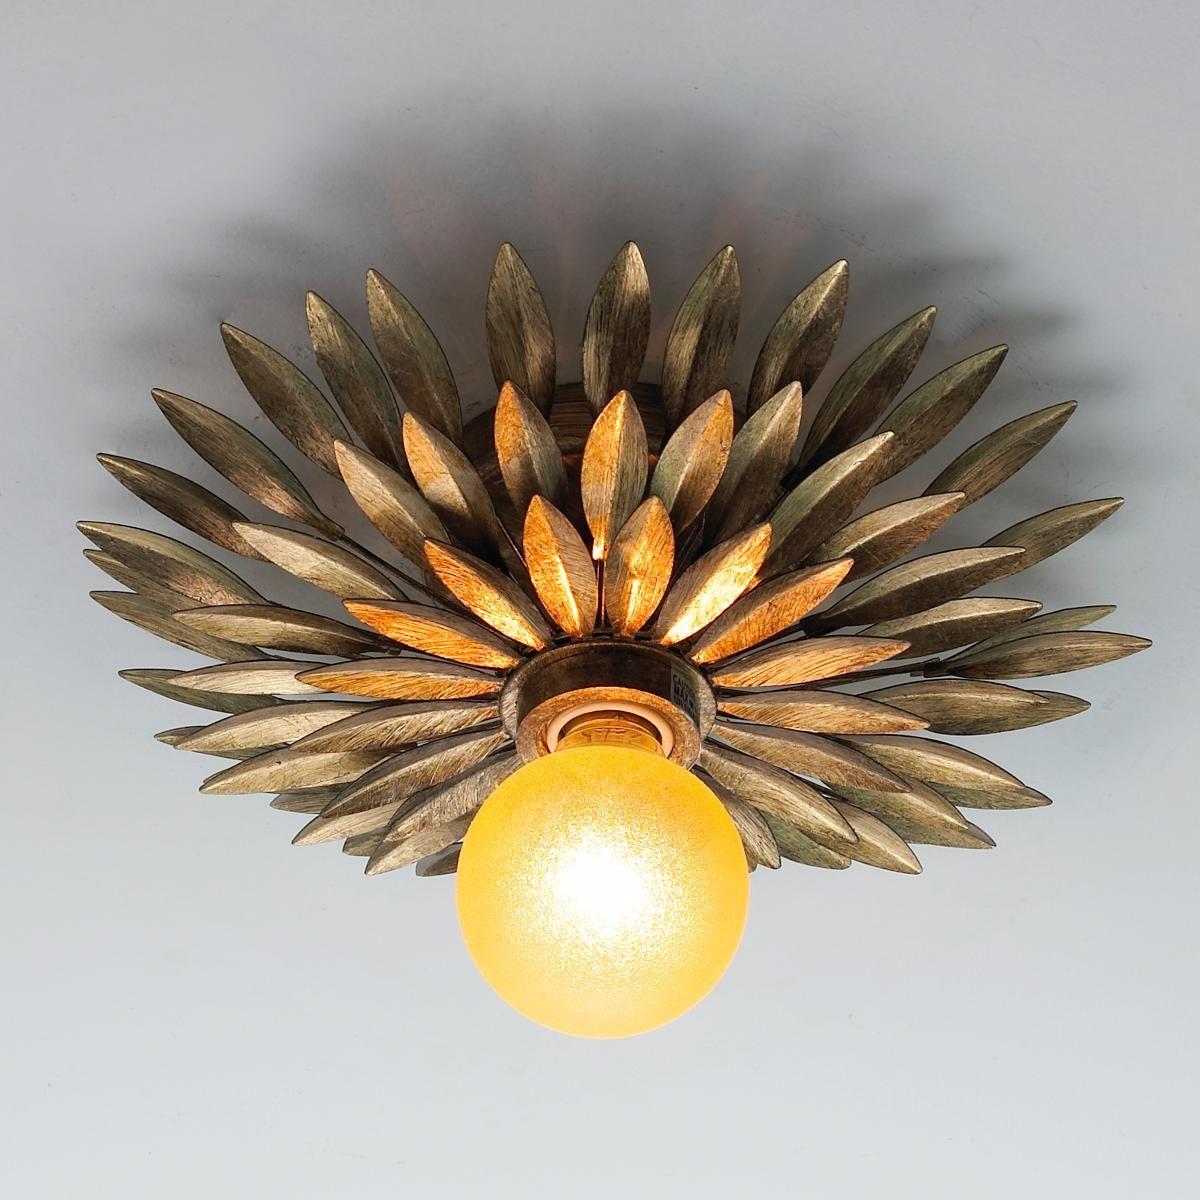 Sunburst Mirror Medallion Diy Ceiling Medallions Diy Home Decor